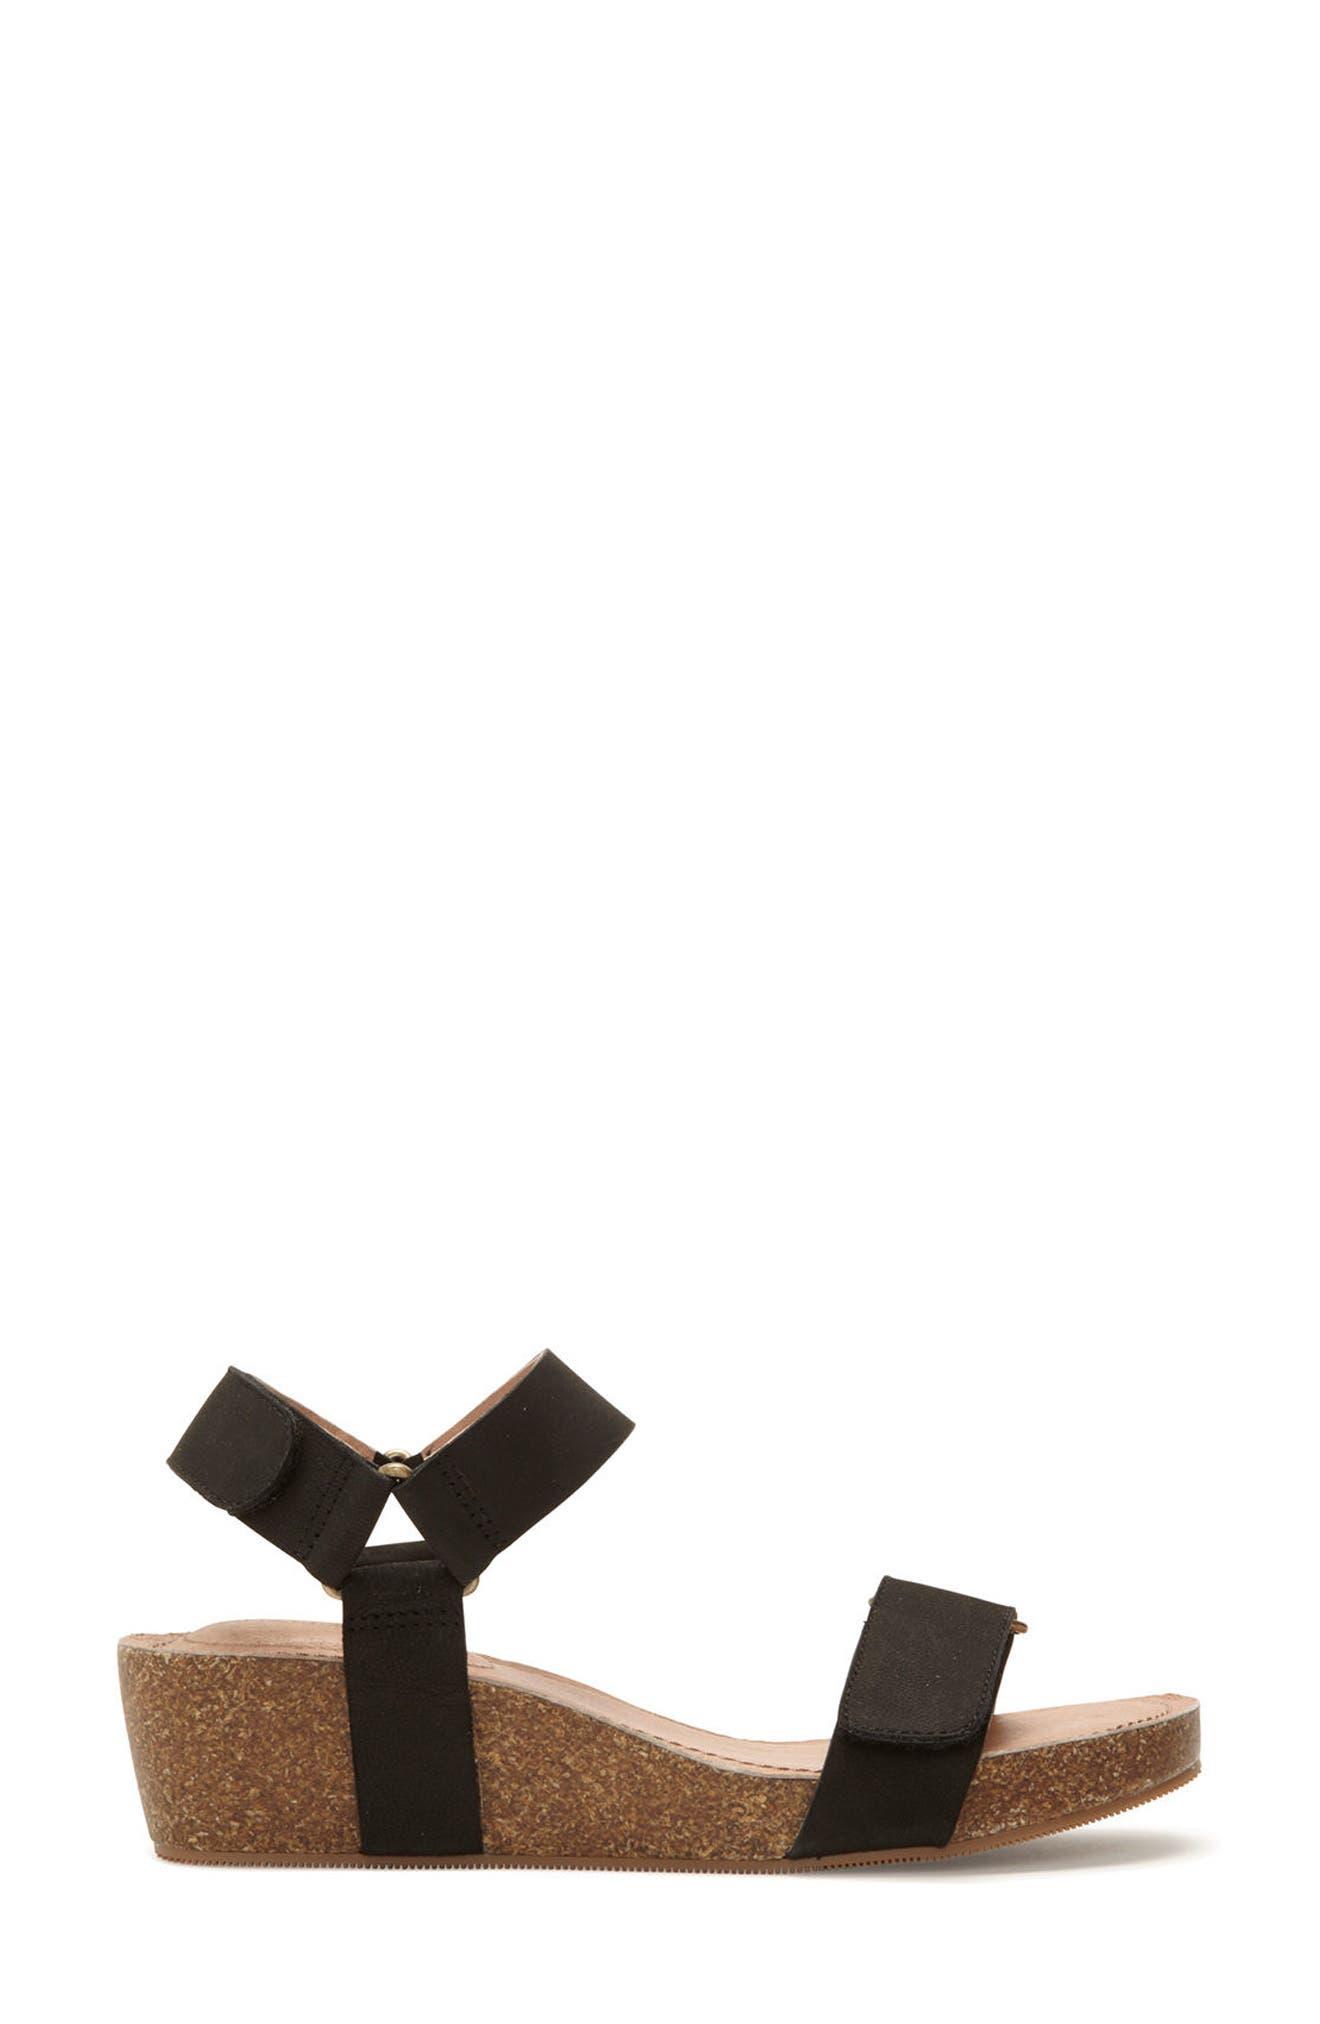 Adam Tucker Shea Wedge Sandal,                             Alternate thumbnail 3, color,                             Black Nubuck Leather